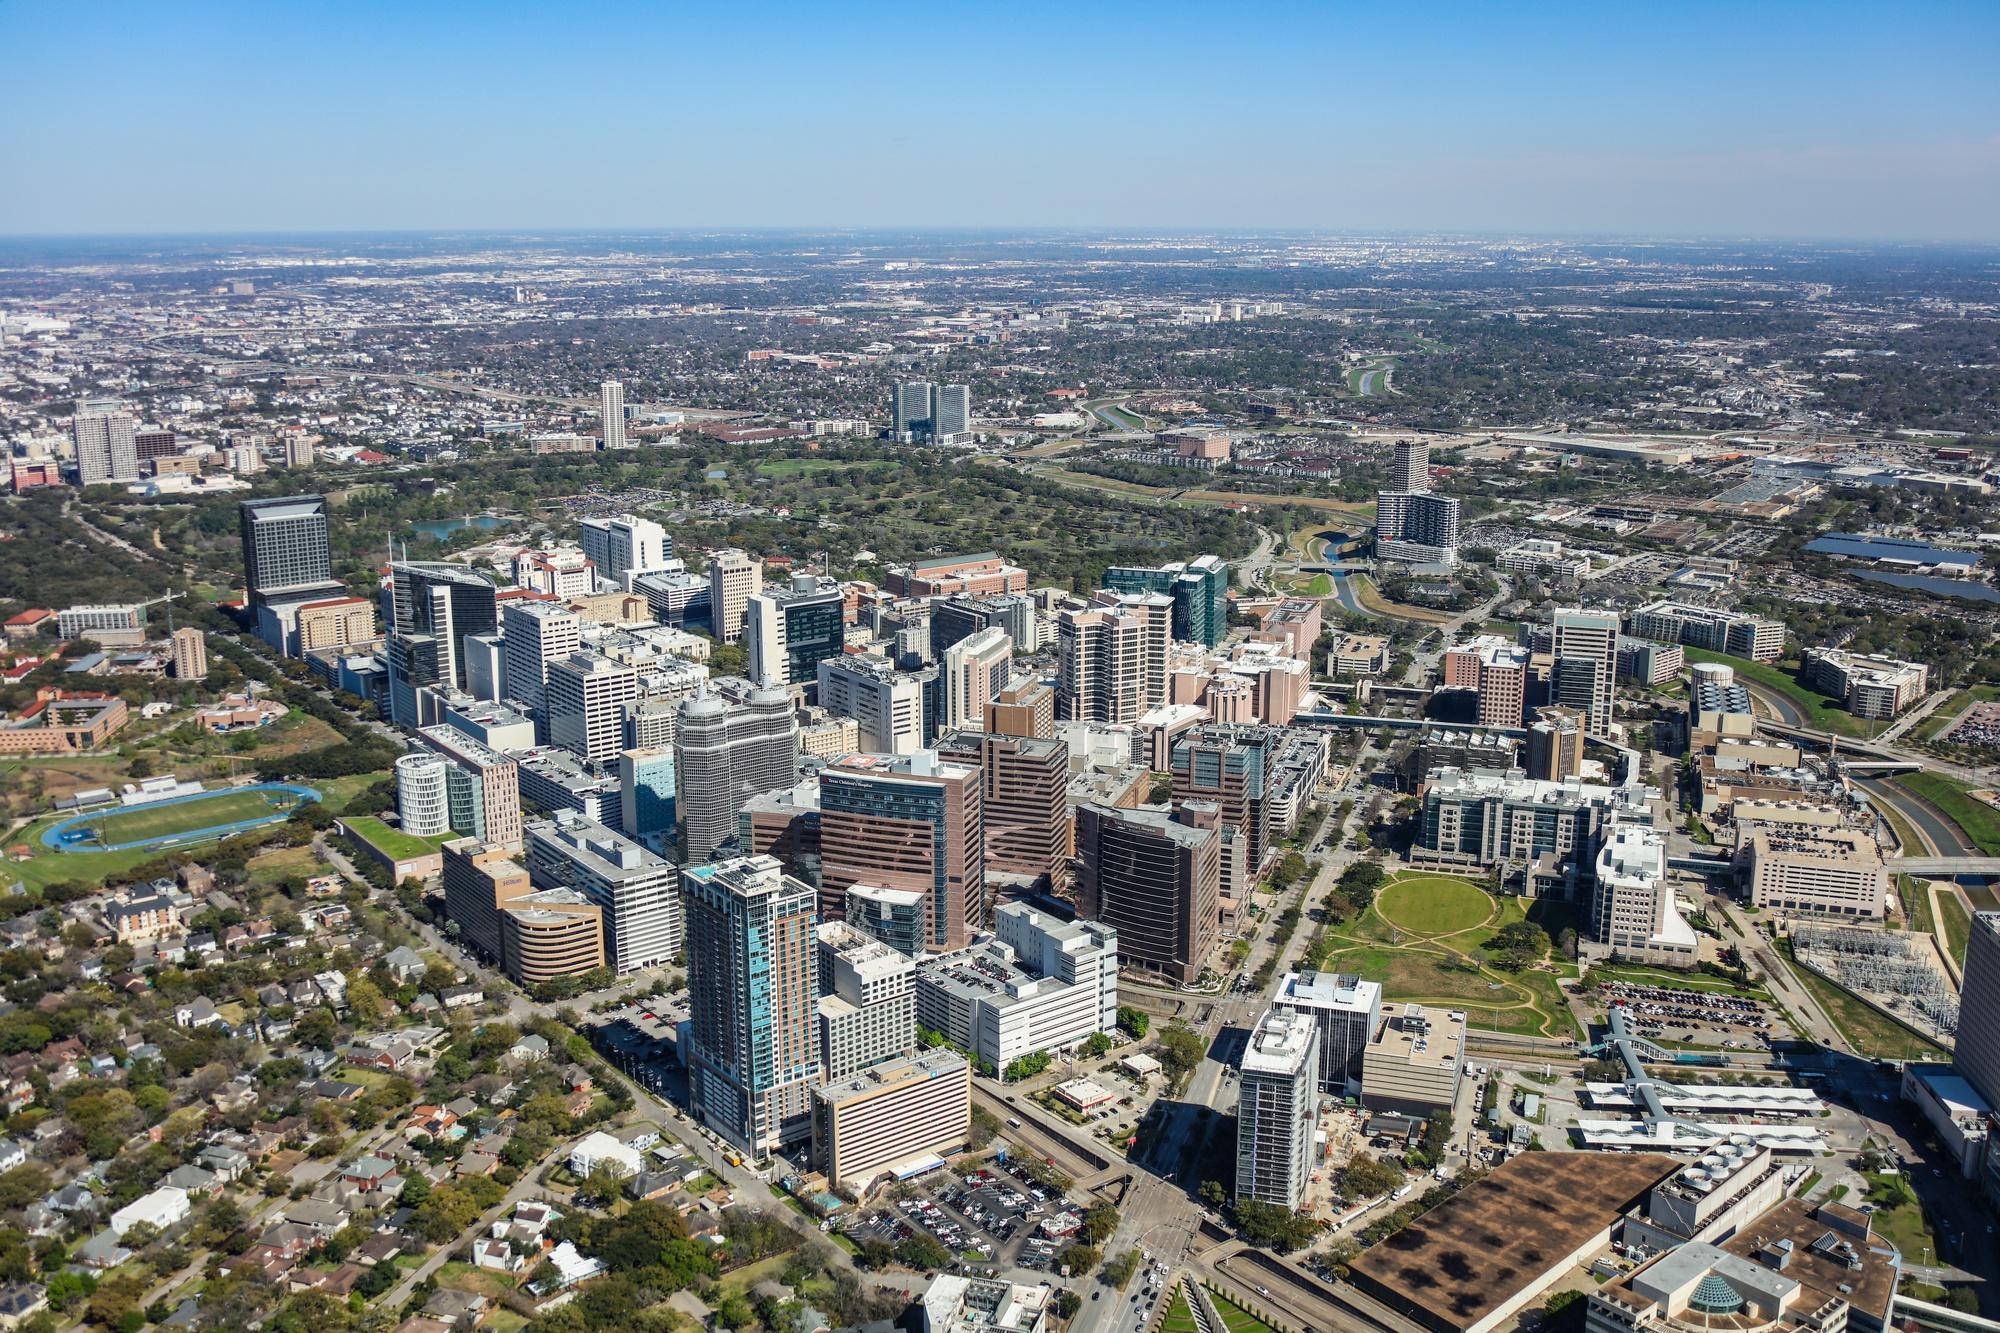 Houston Aerial Photography